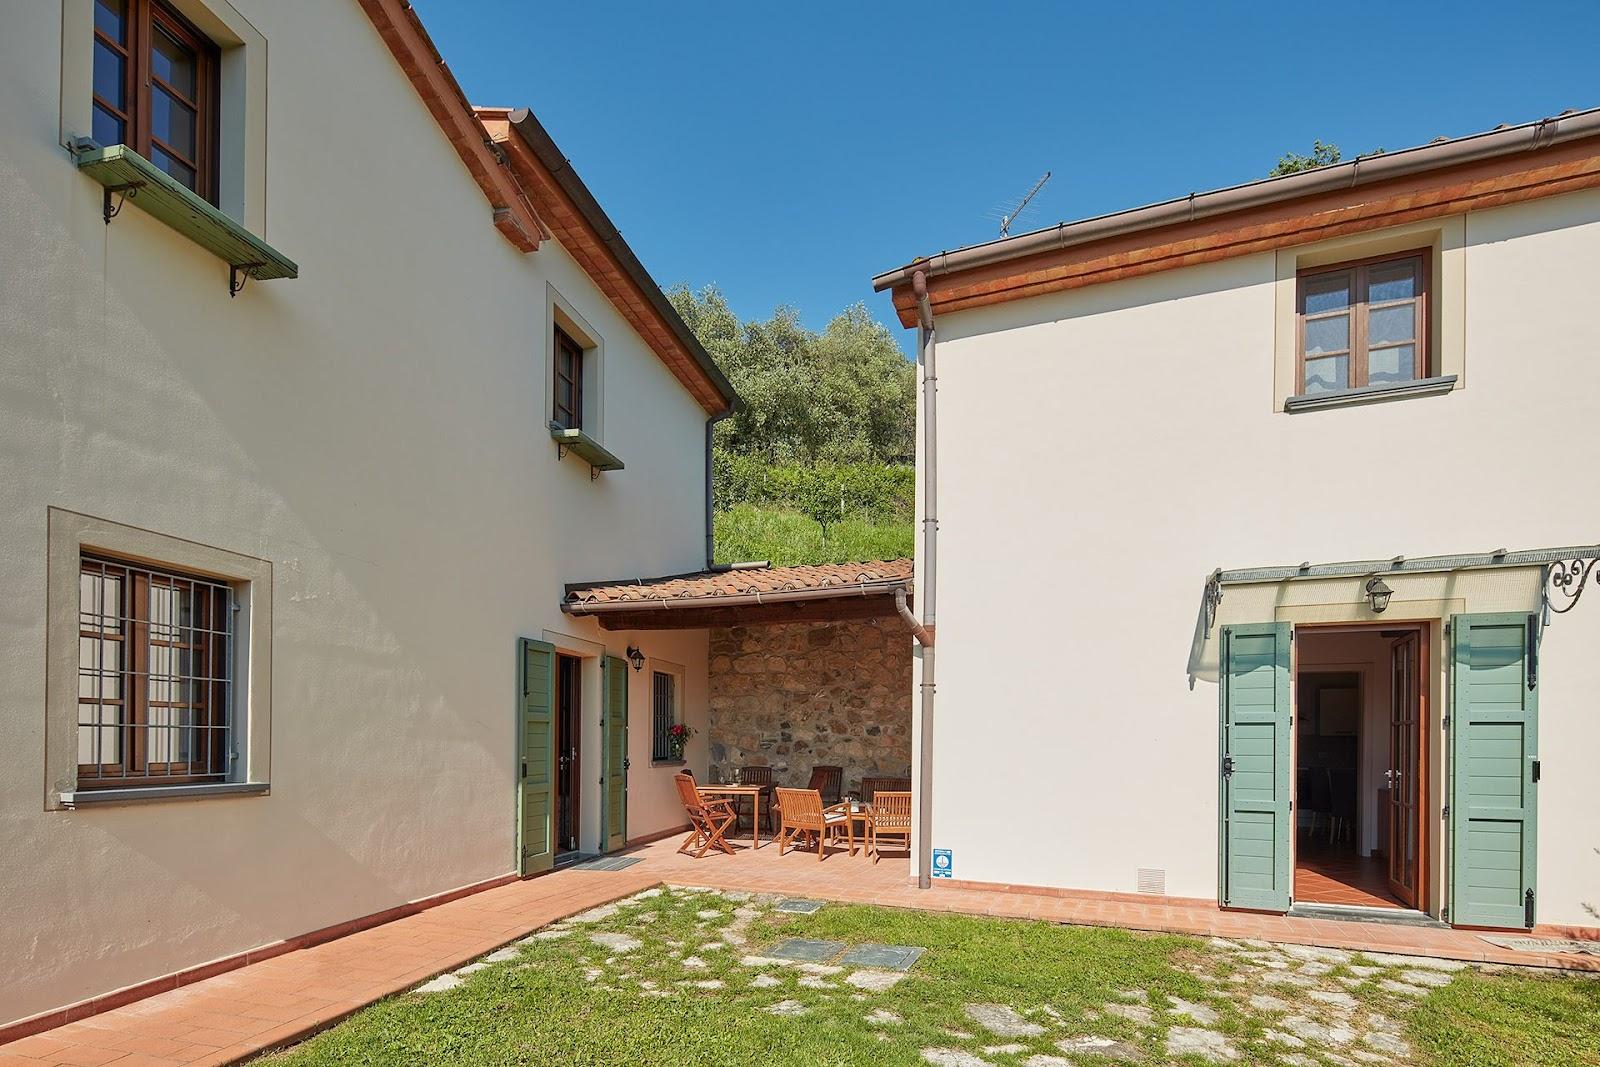 Ferienhaus Corte Paradiso (2570342), Monsummano Terme, Pistoia, Toskana, Italien, Bild 7